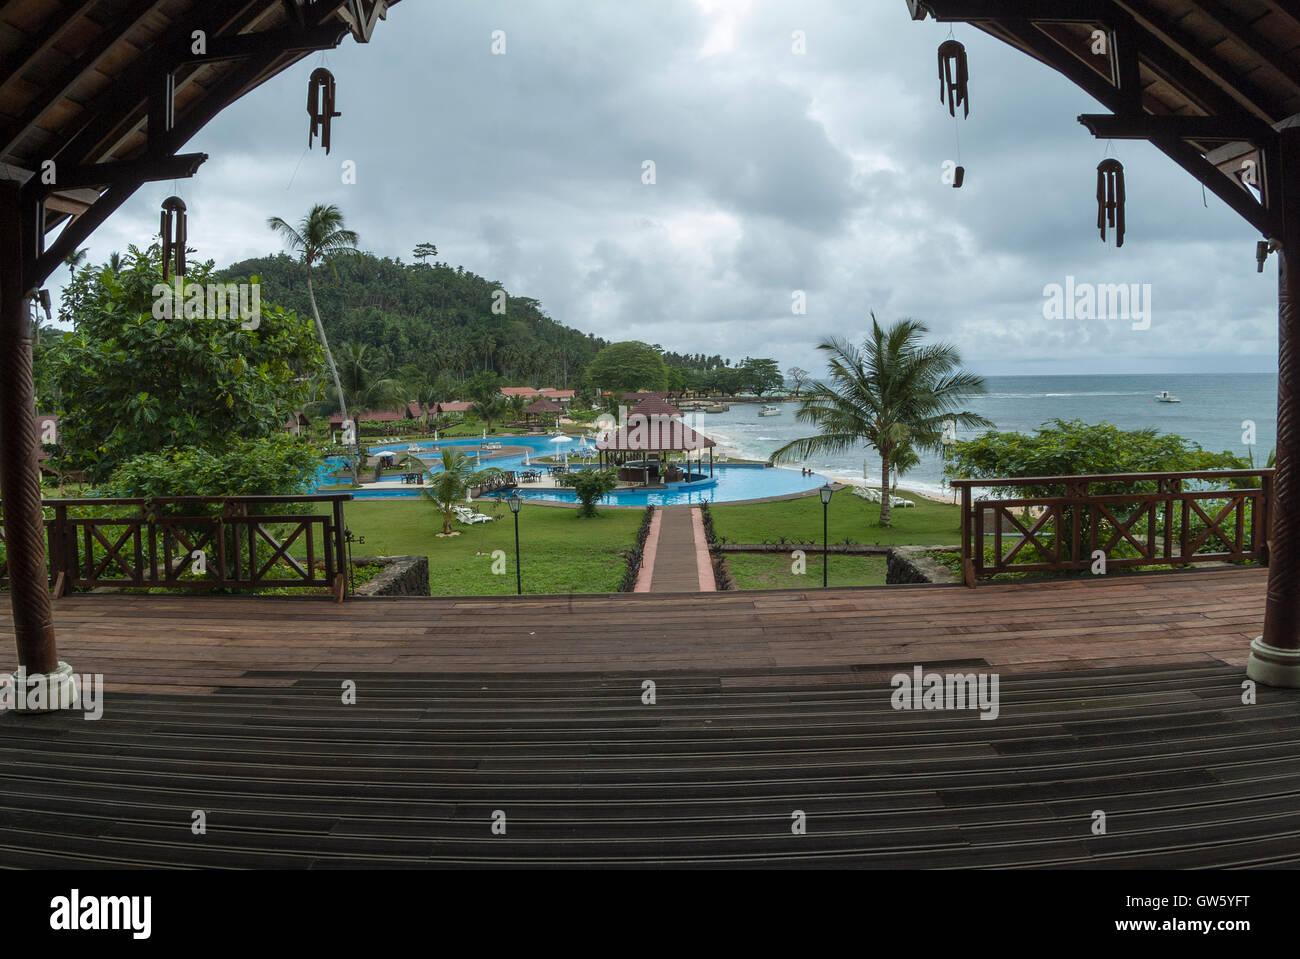 Rolas Island Resort